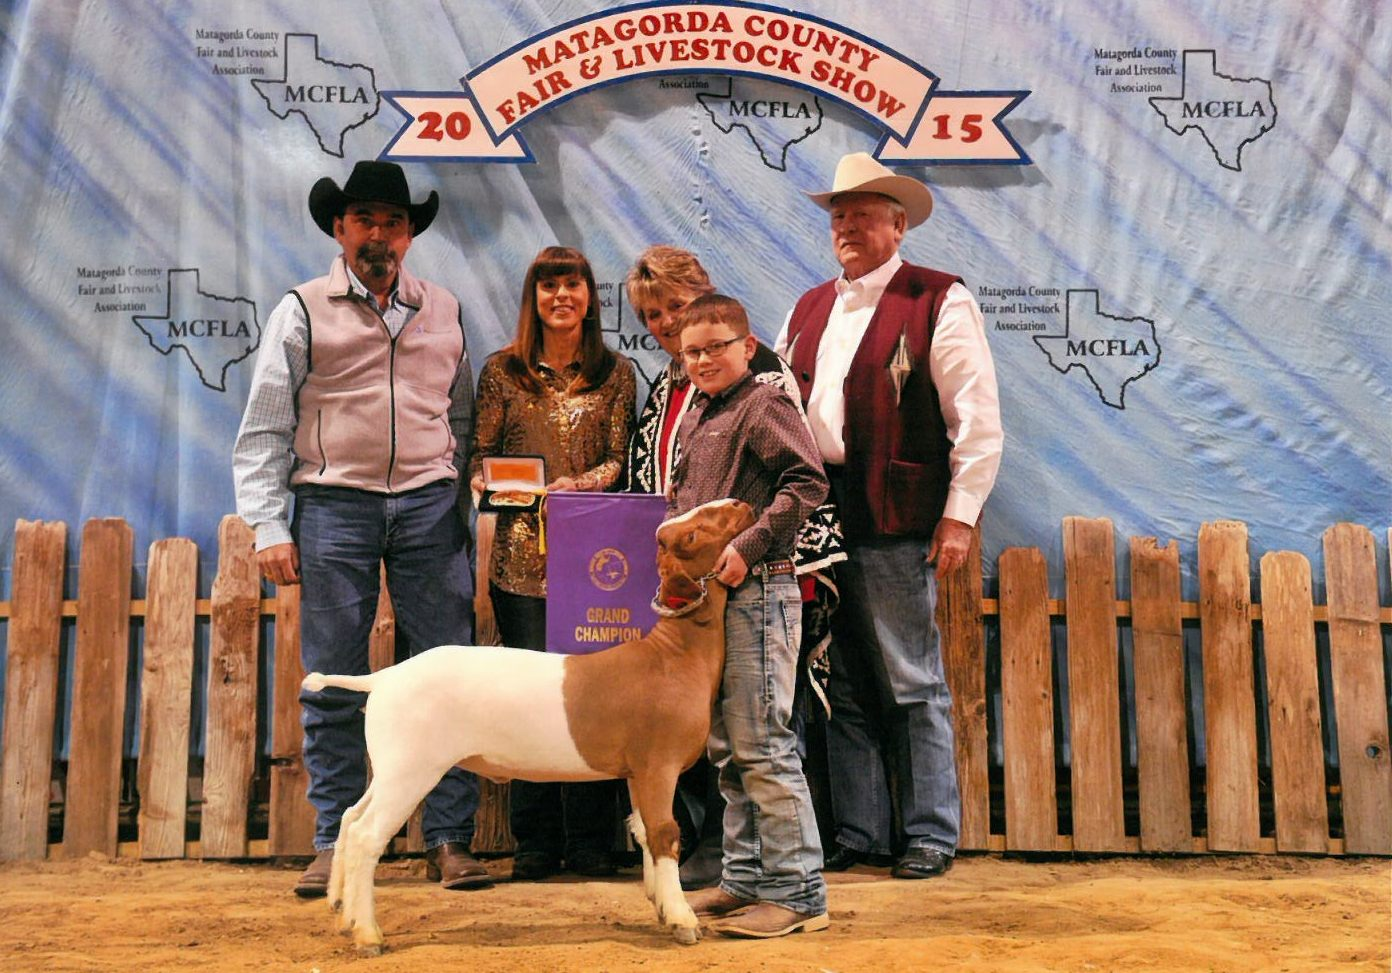 Matagorda County Fair Amp Livestock Association Home